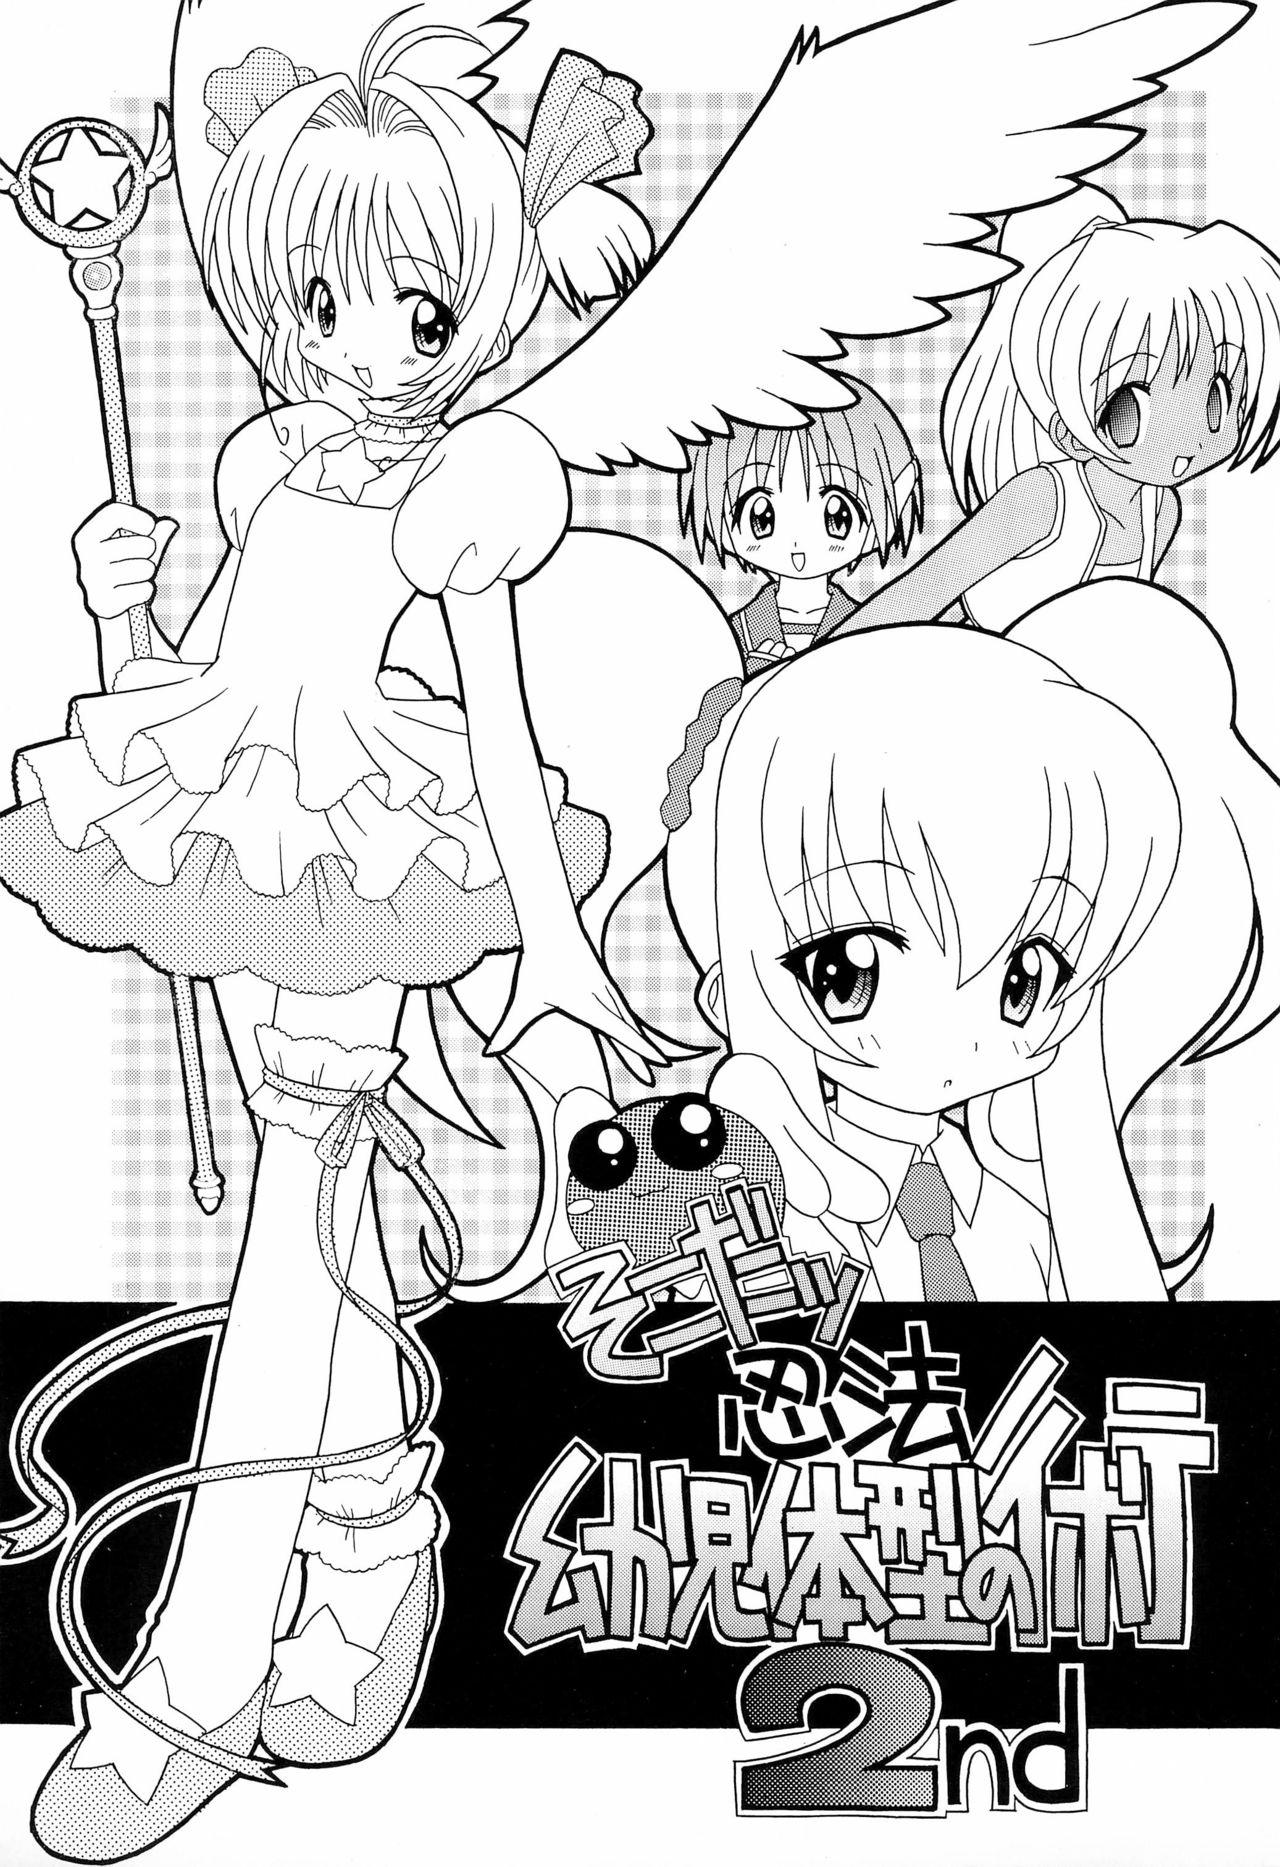 Soko da! Ninpou Youji Taikei no Jutsu 2nd 0